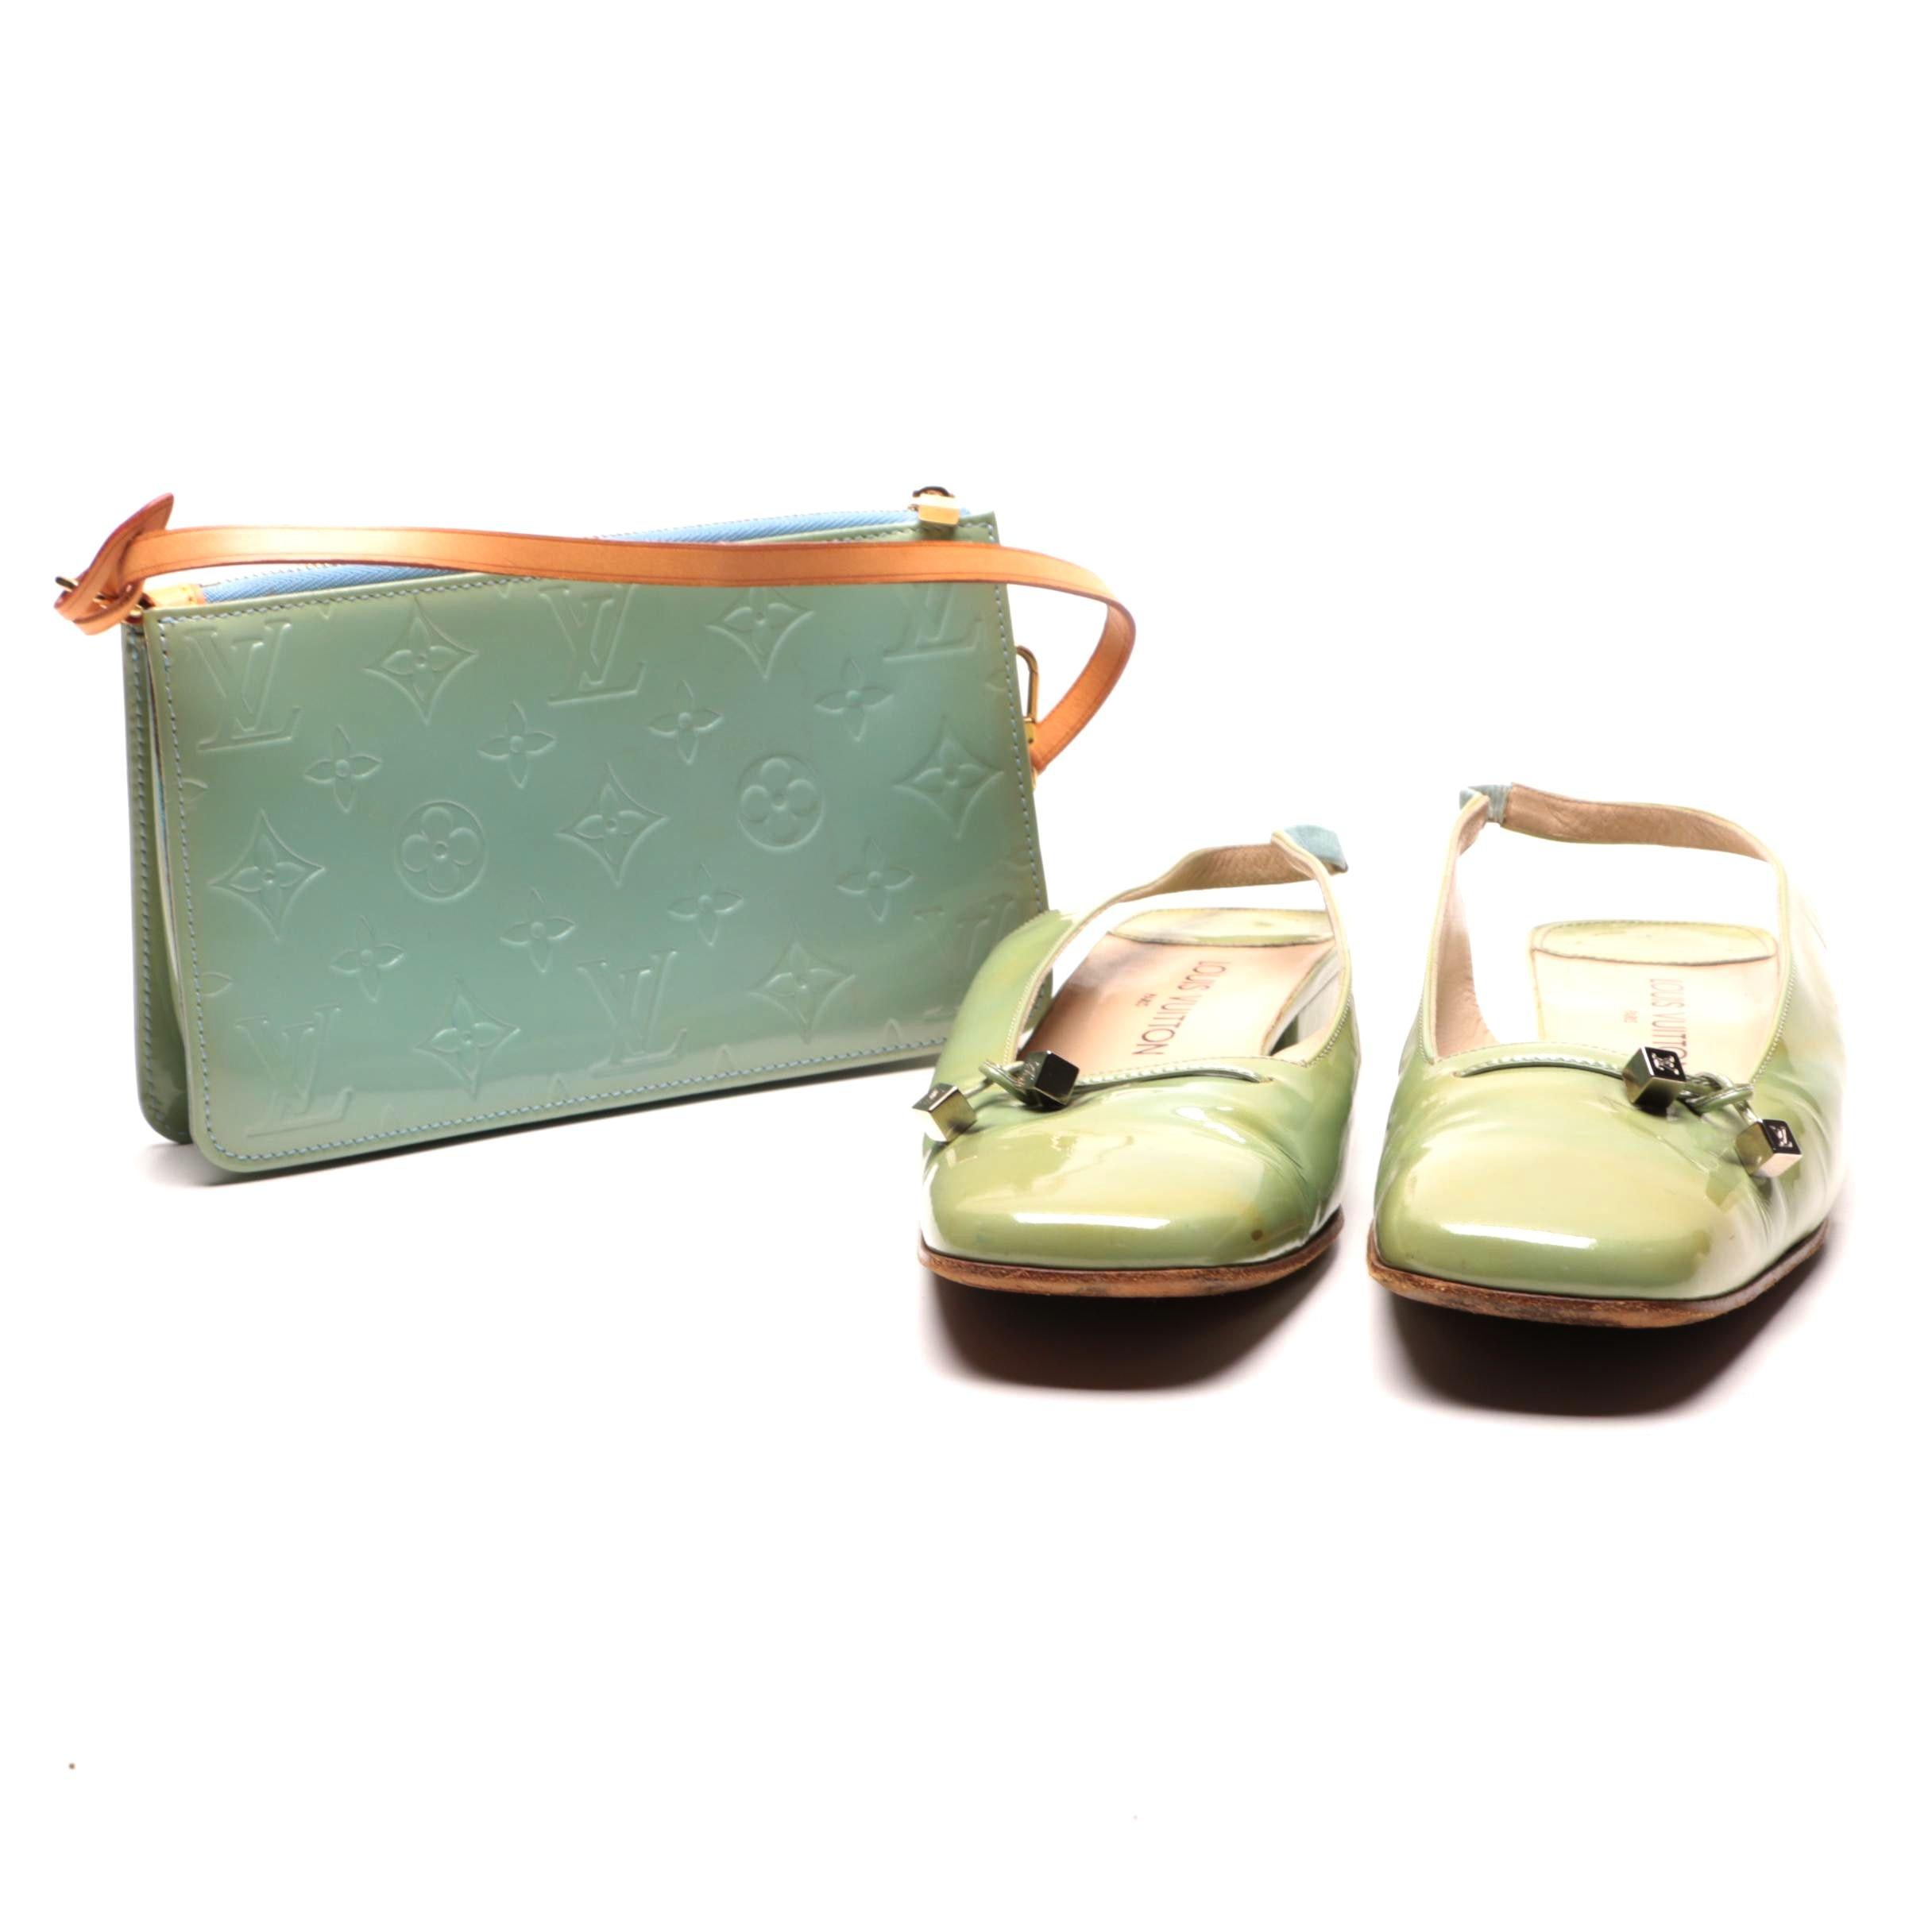 Louis Vuitton Wristlet and Shoes